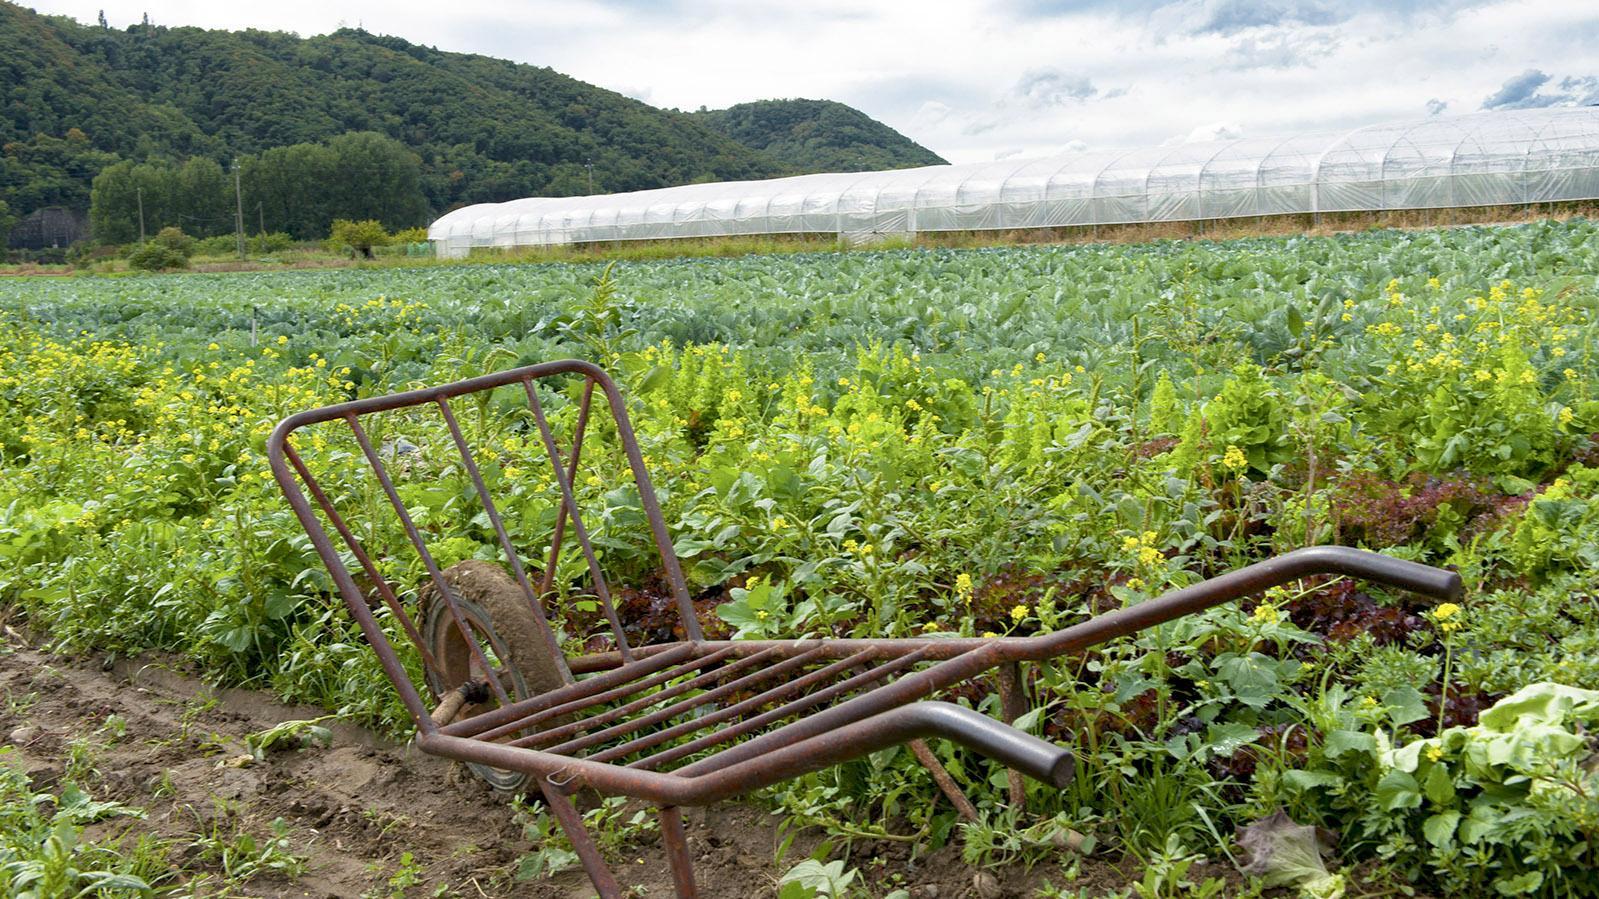 Gemüsenanbau im Rhône-Tal. Foto: Hilke Maunder